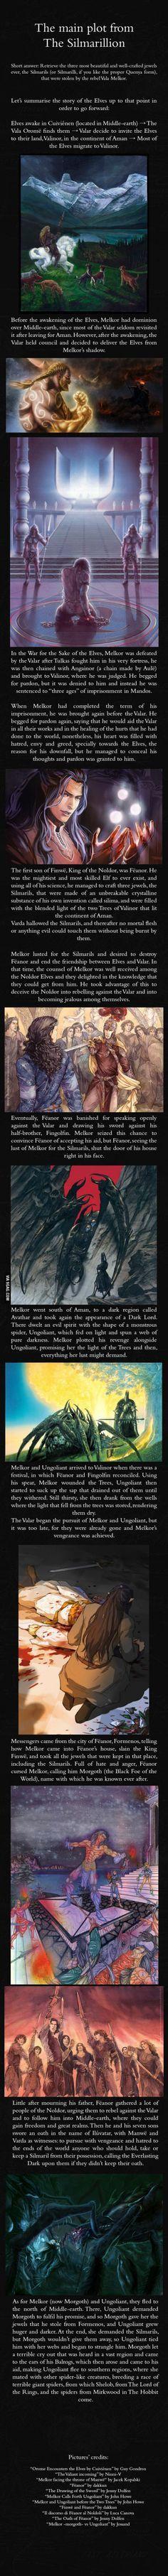 The Silmarillion main plot - J.R.R. Tolkien's Mythology